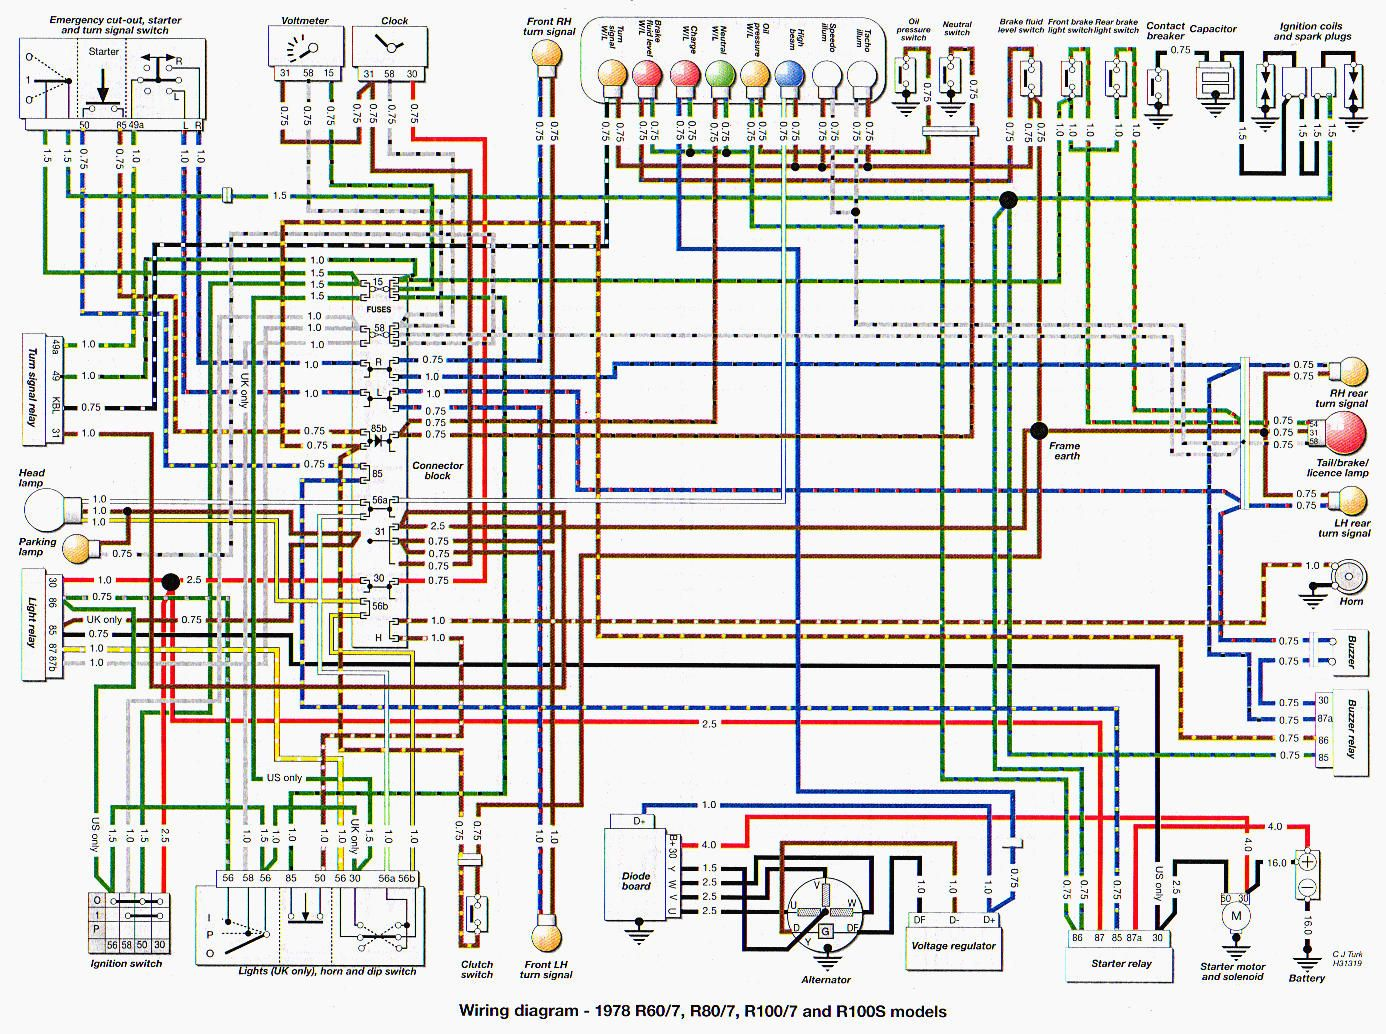 bmw mini stereo wiring diagram hss coil split r80 google søgning 7